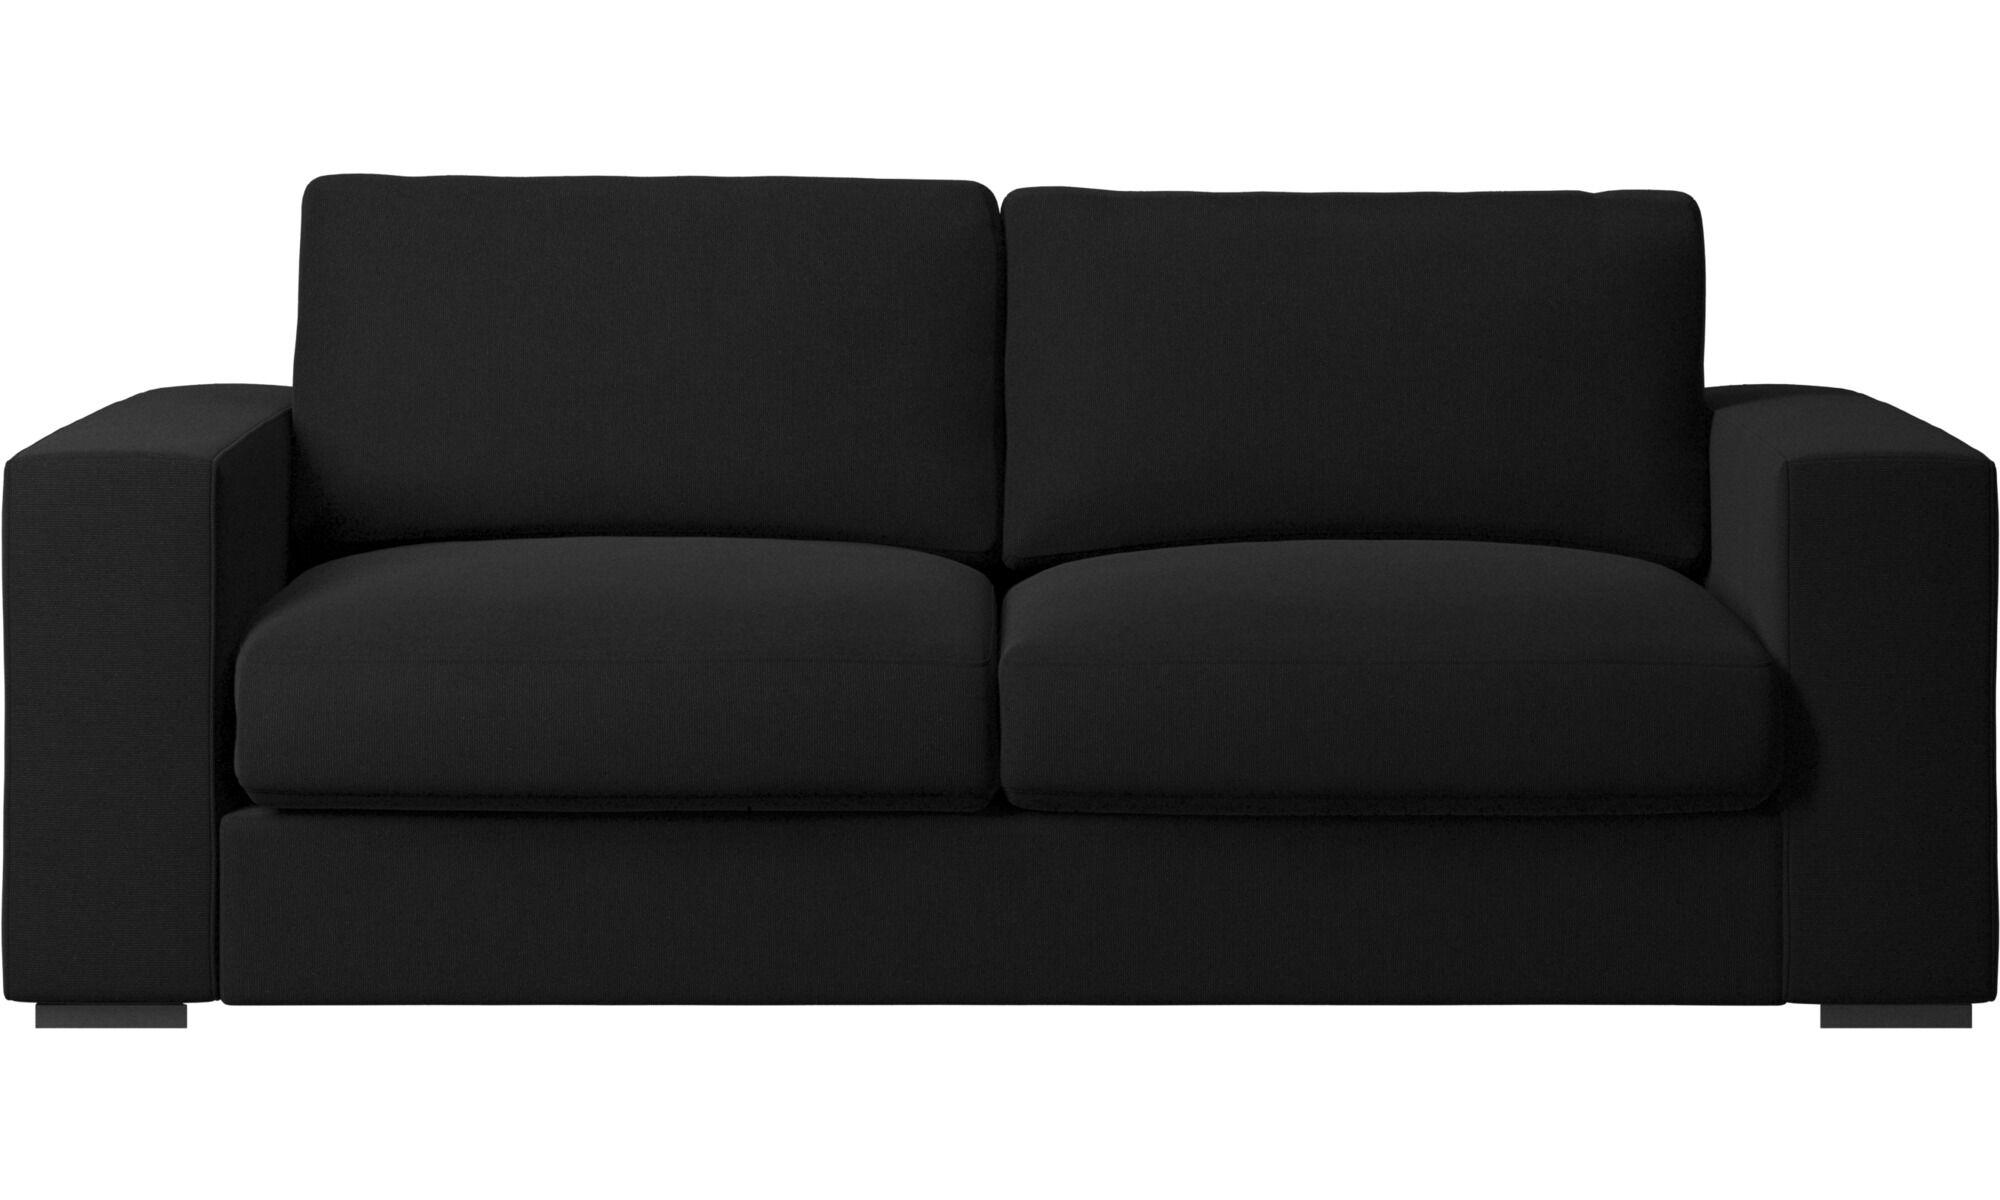 Exceptional 2.5 Seater Sofas   Cenova Sofa   Black   Fabric